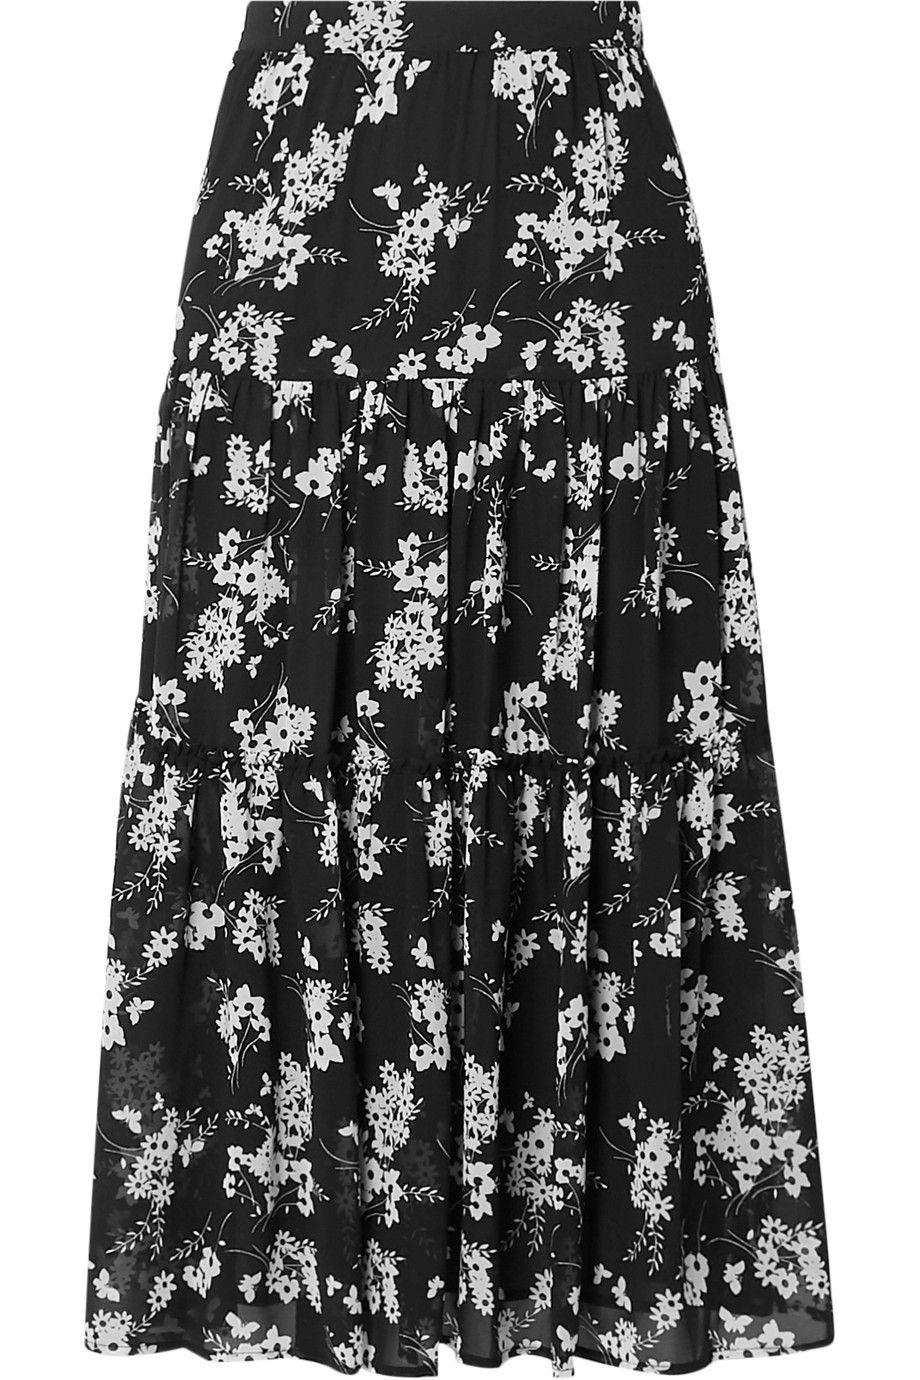 Tiered Floral-Print Chiffon Skirt